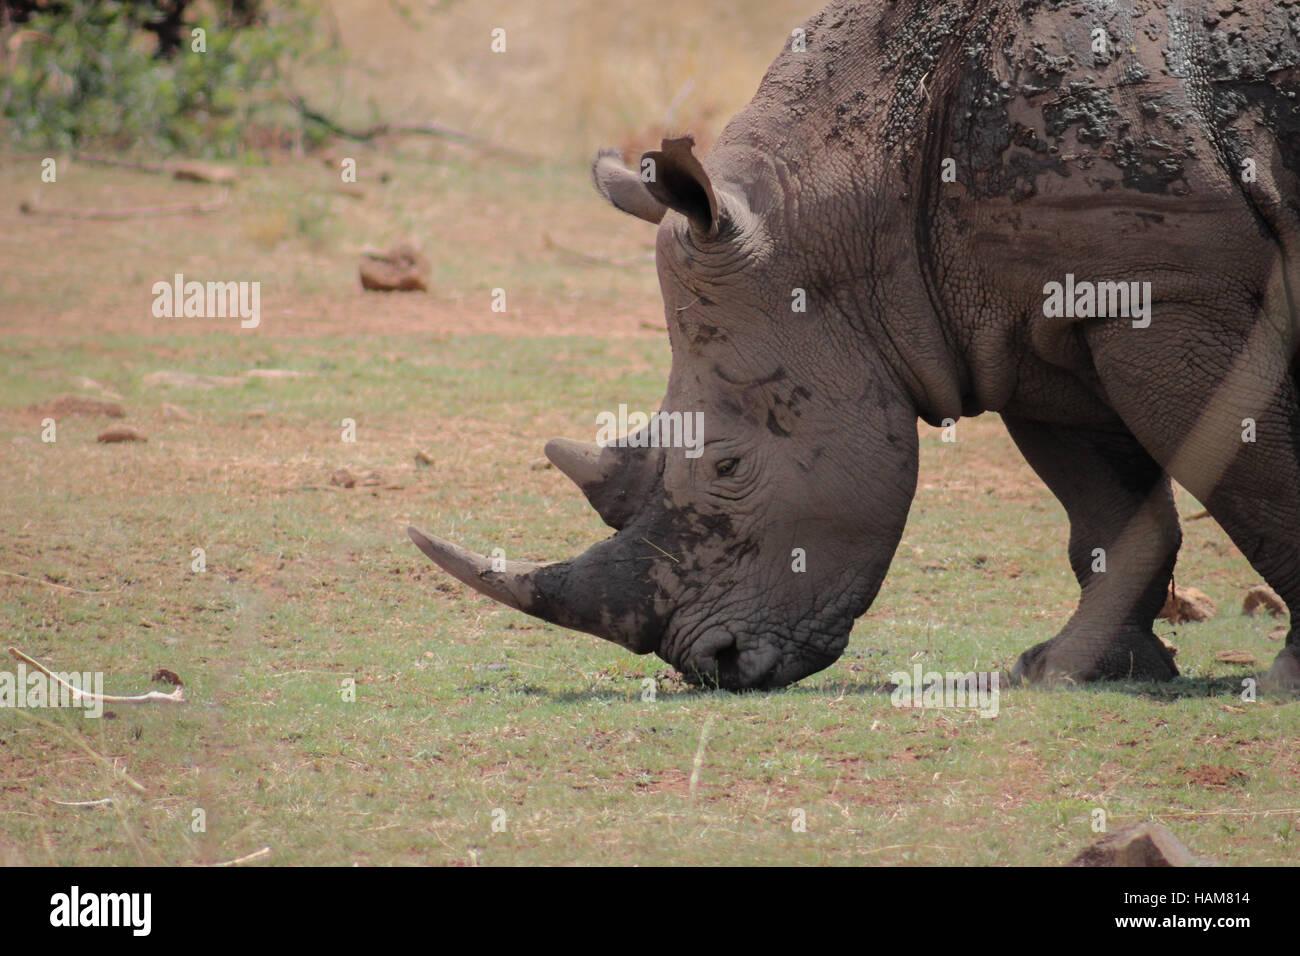 White rhinoceros closeup photo - Stock Image